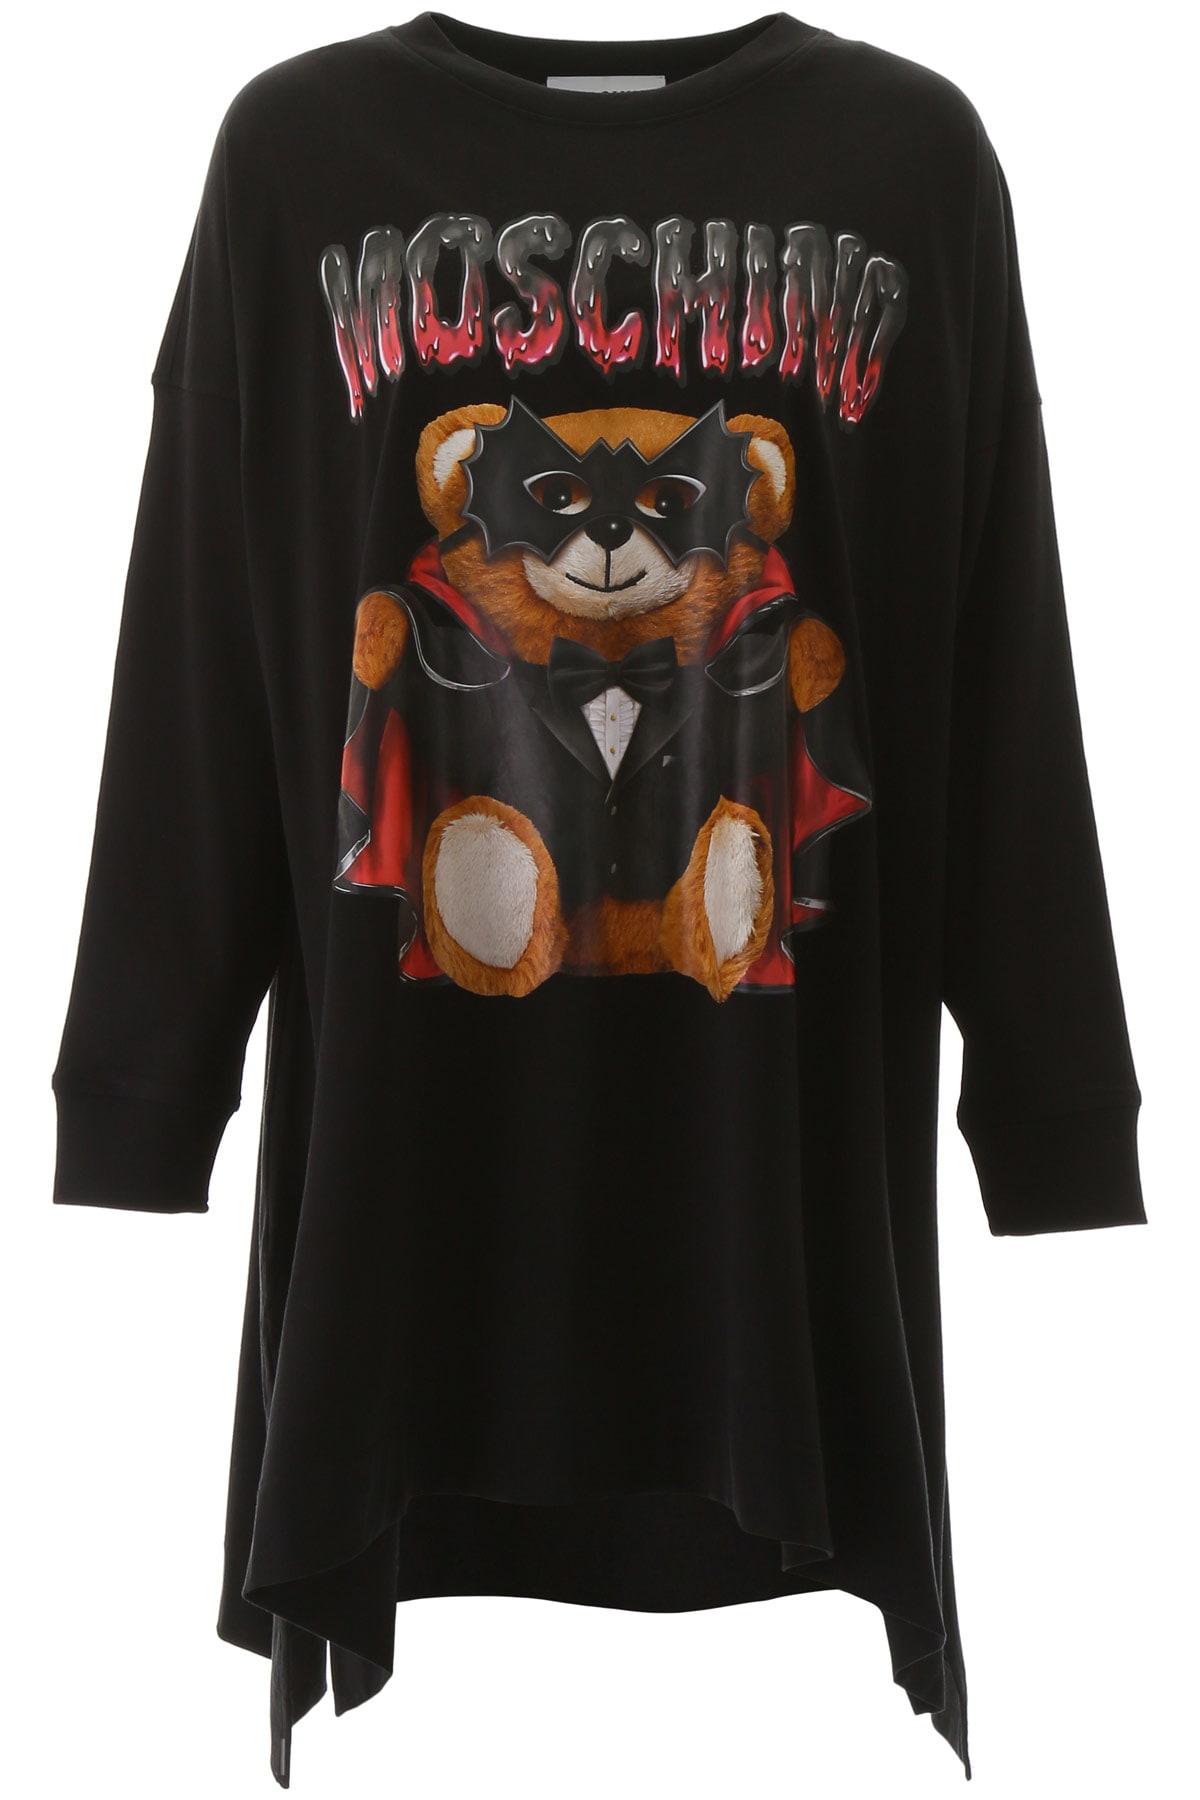 Buy Moschino Bat Teddy Bear Dress online, shop Moschino with free shipping